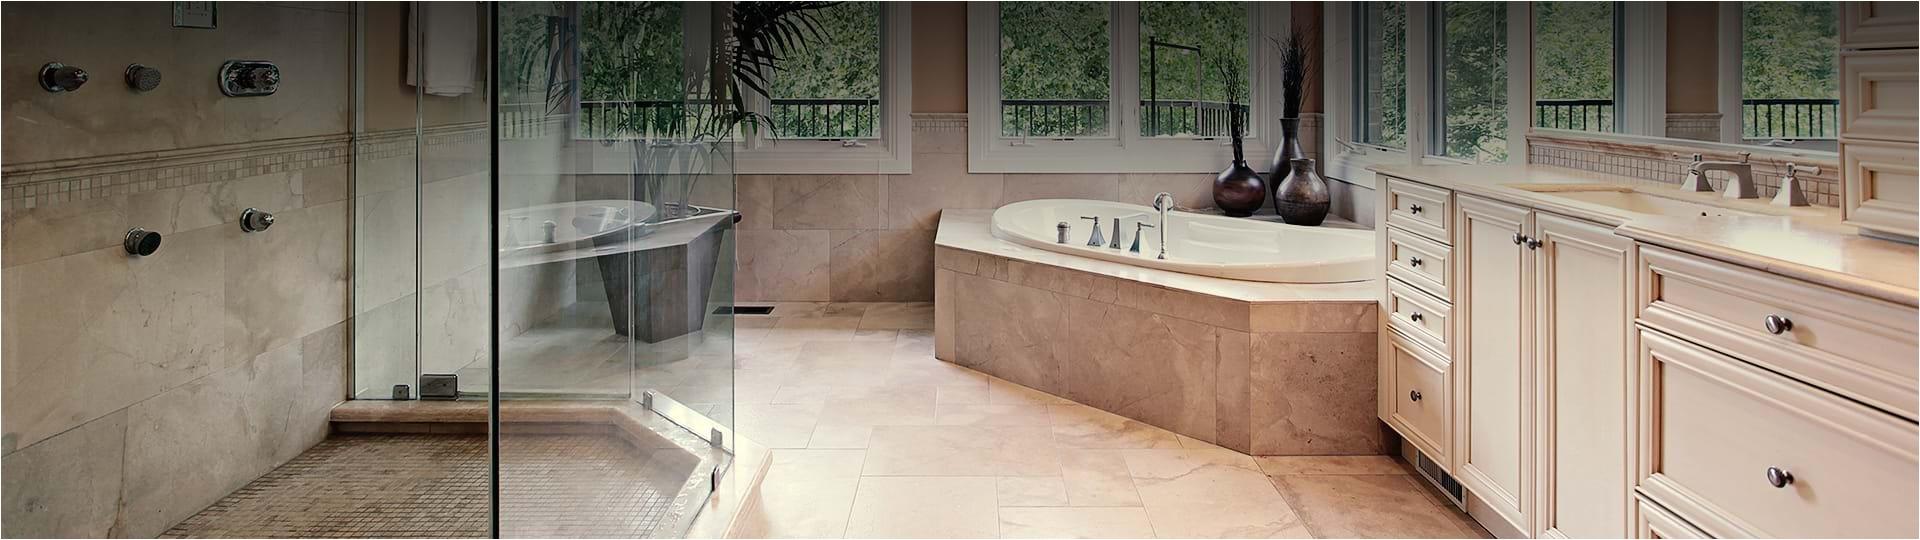 Yeager Flooring 2310 Success Dr Odessa Fl 33556 Dealer Locator Kbrs Shower Systems